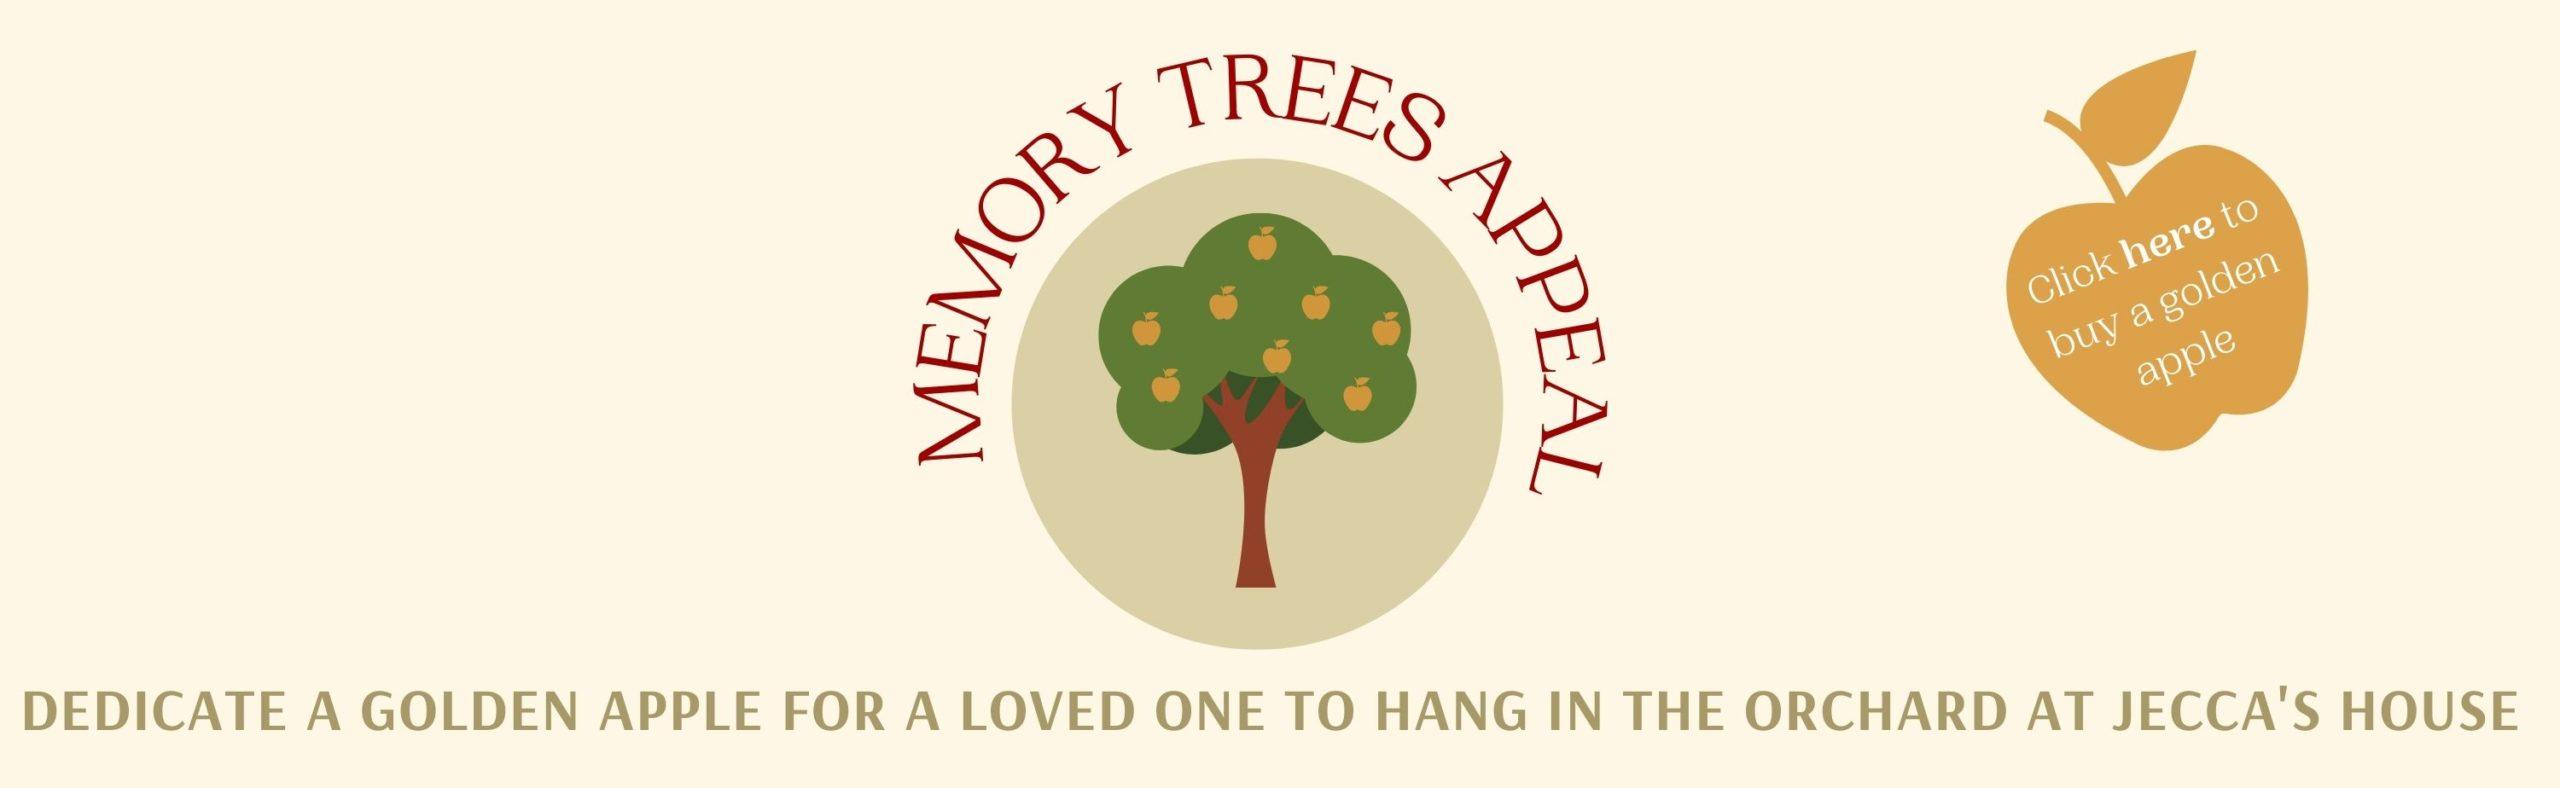 Memory Trees Appeal, Campden Home Nursing